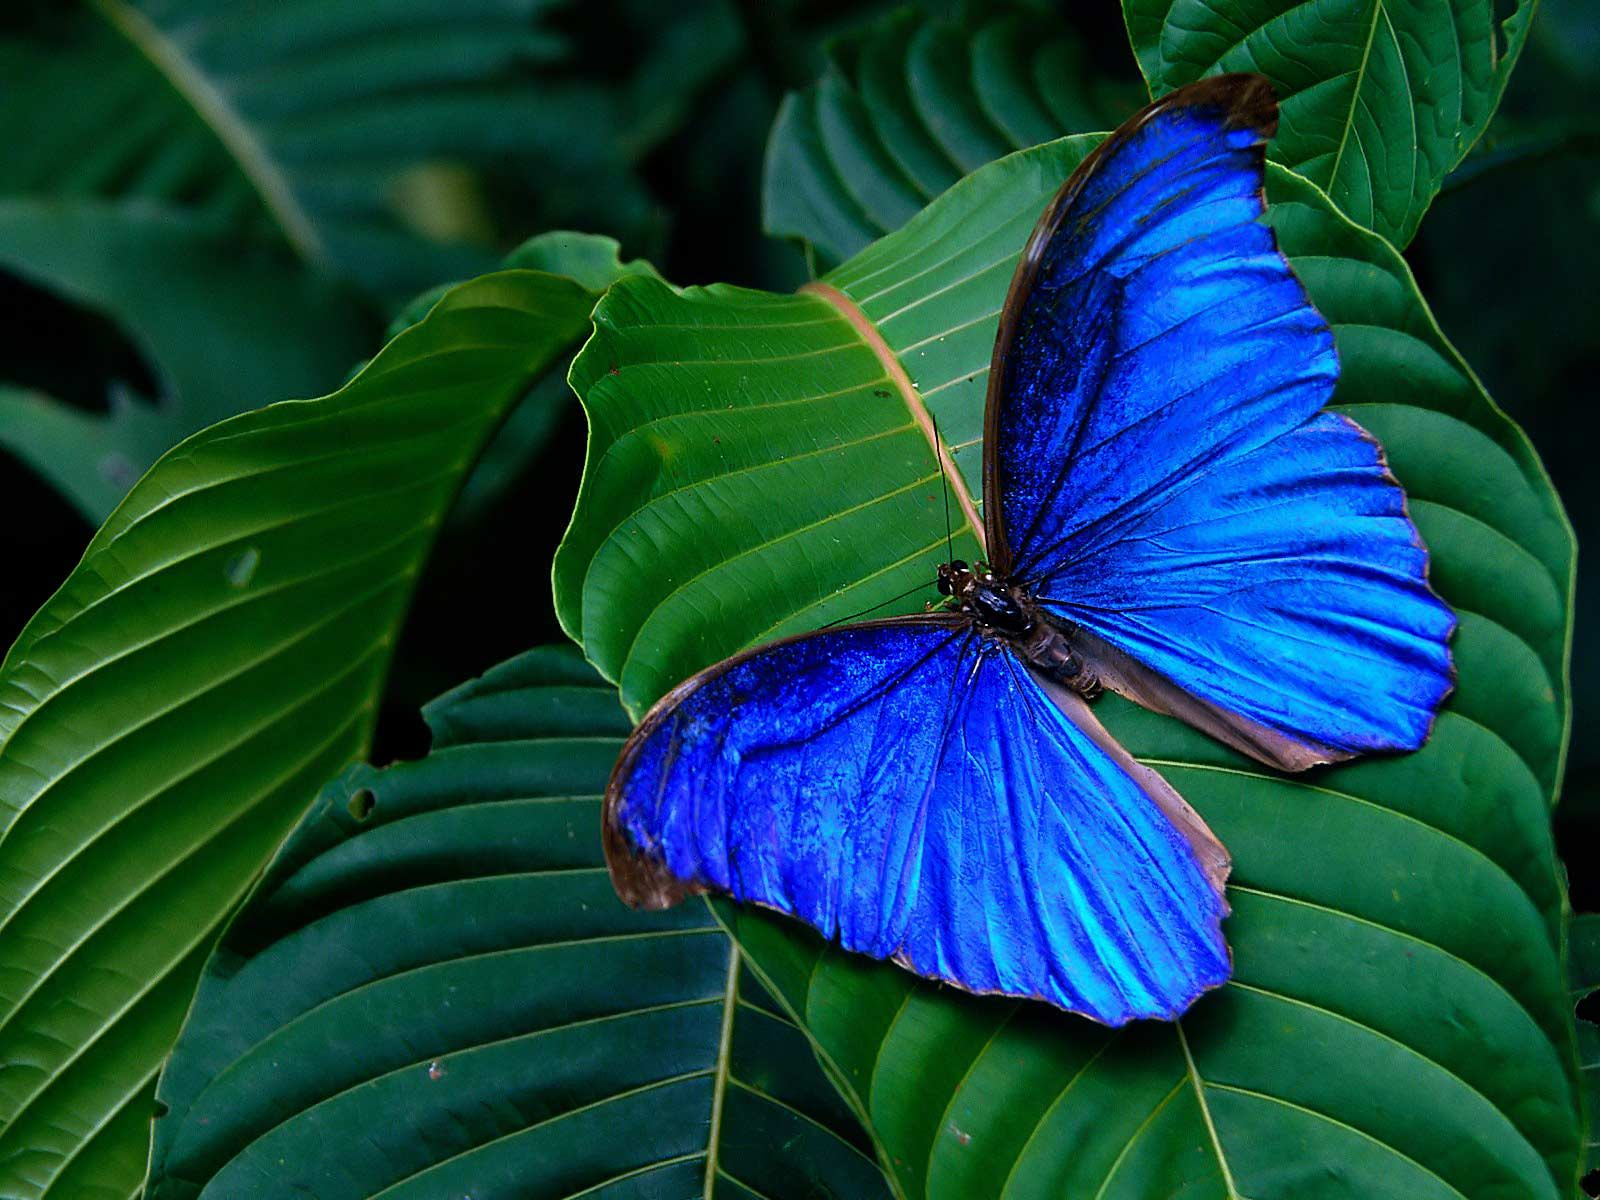 Wallpapers Background Butterfly Hd Wallpaper Butterfly 3d Wallpapers 1600x1200